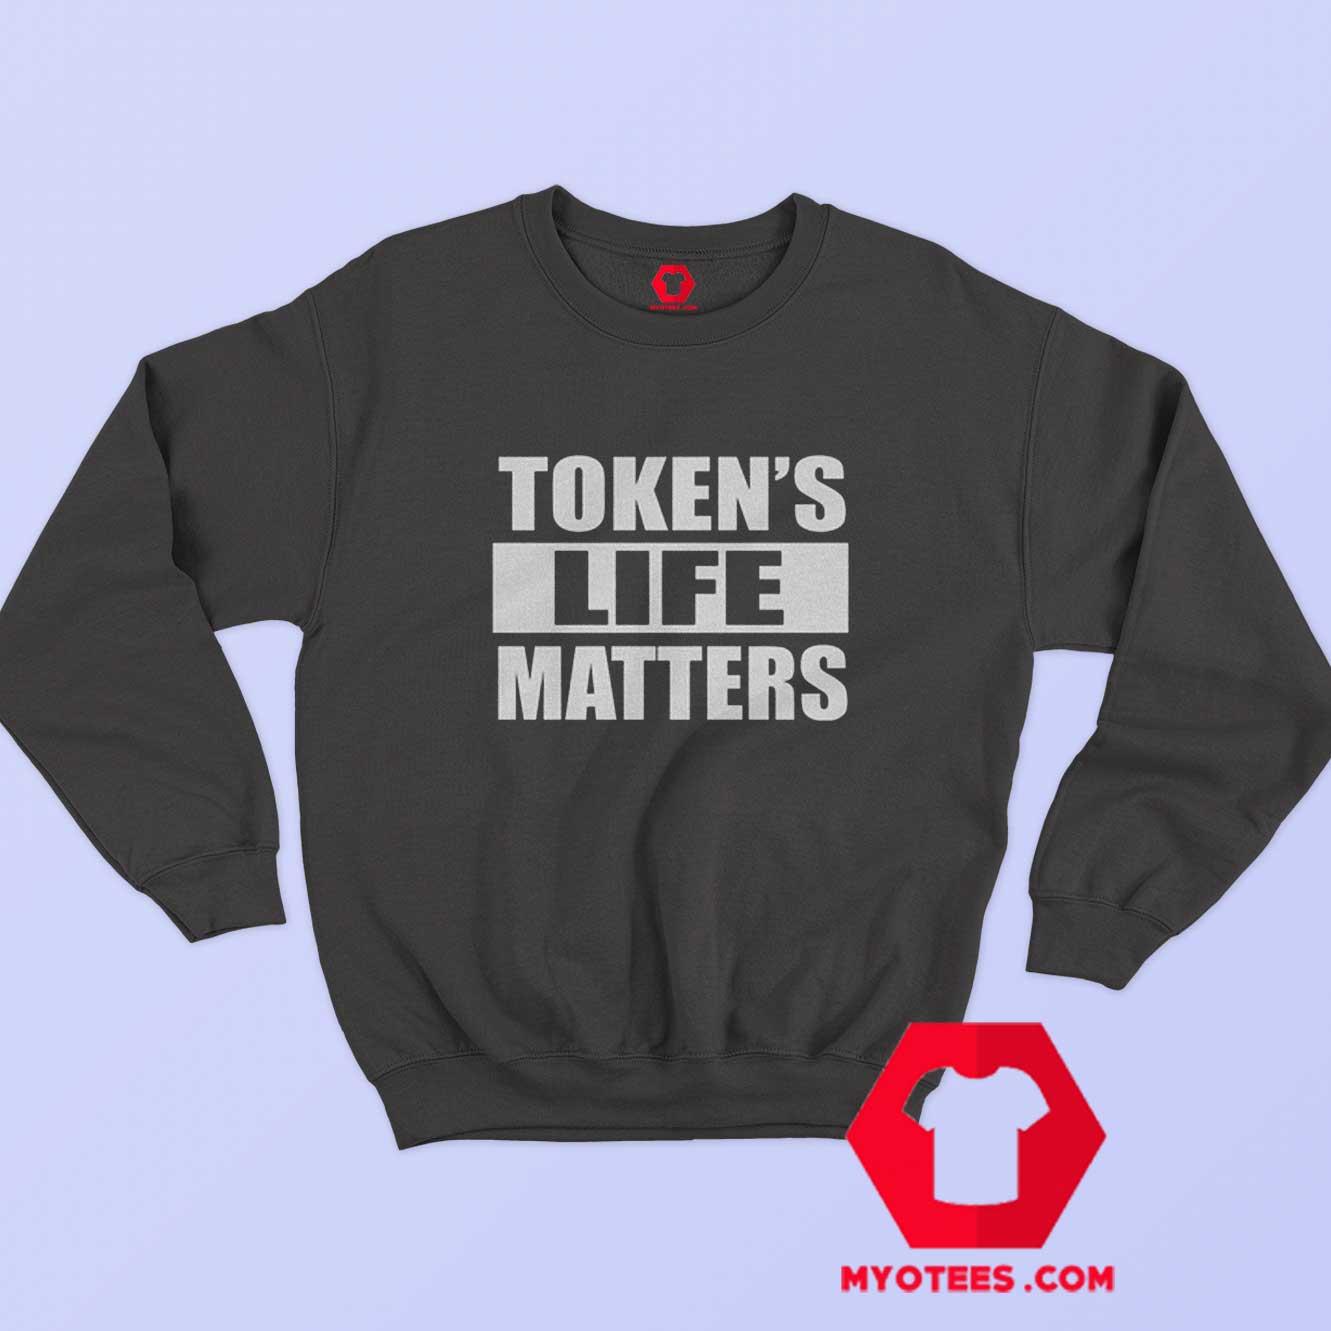 Token/'s Life Matters Funny Slouchy Off Shoulder Oversized Sweatshirt